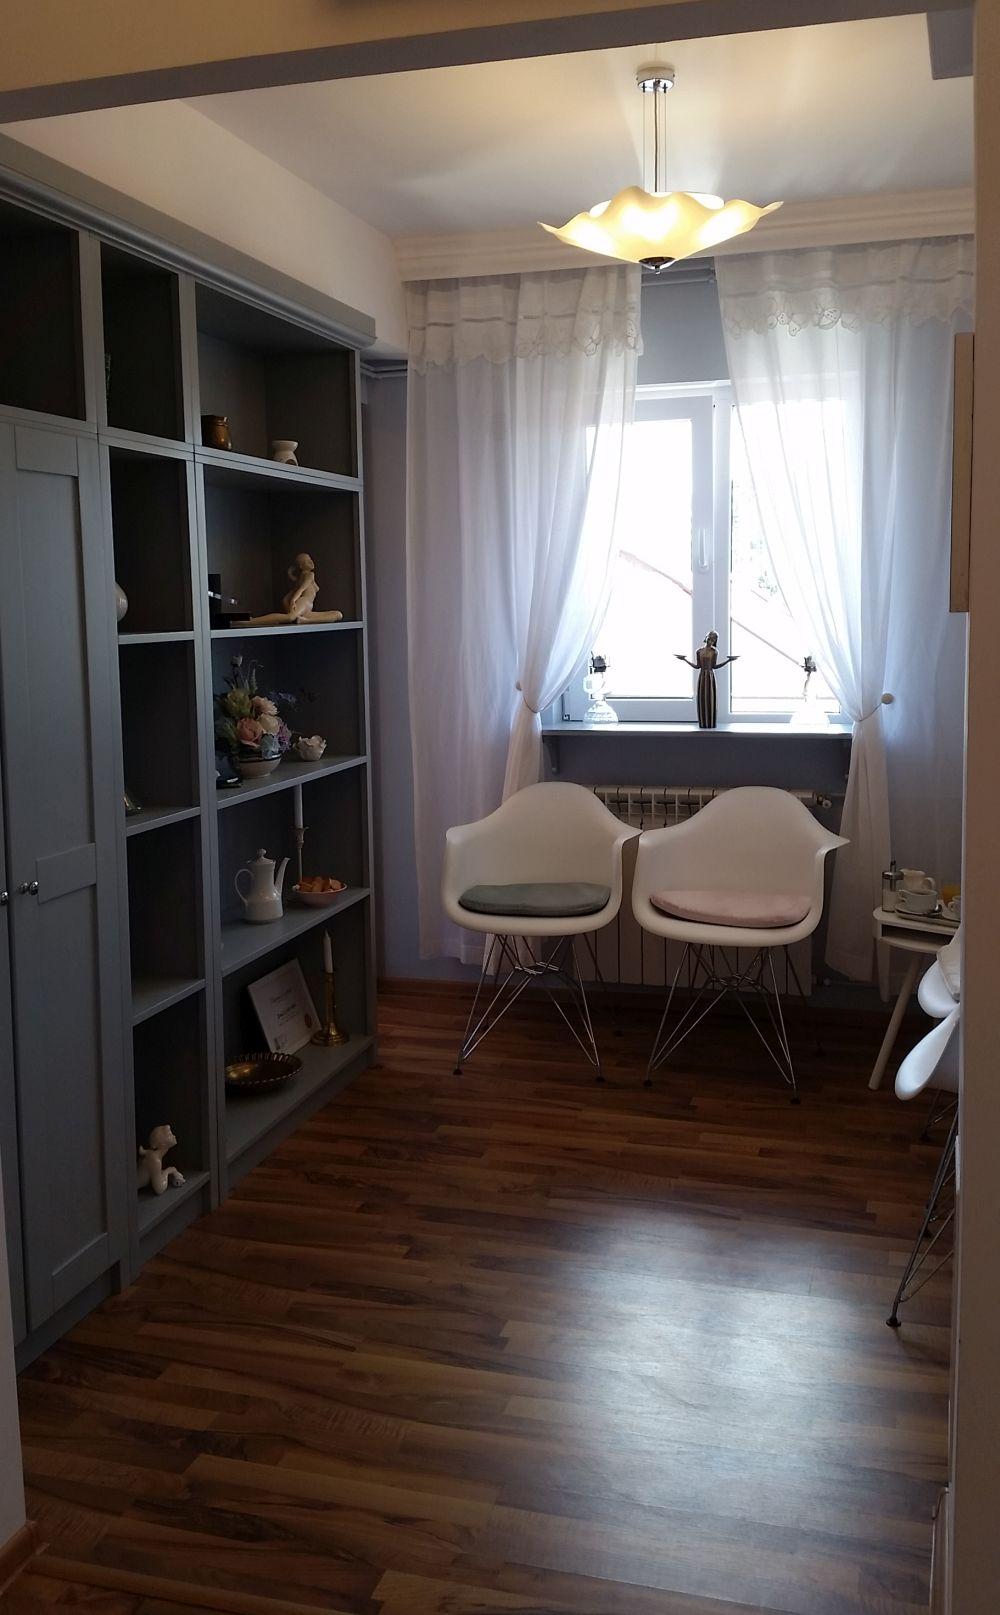 adelaparvu.com despre salon de cosmetica Elena Miron Estet Studio, designer Marinela Filip (21)